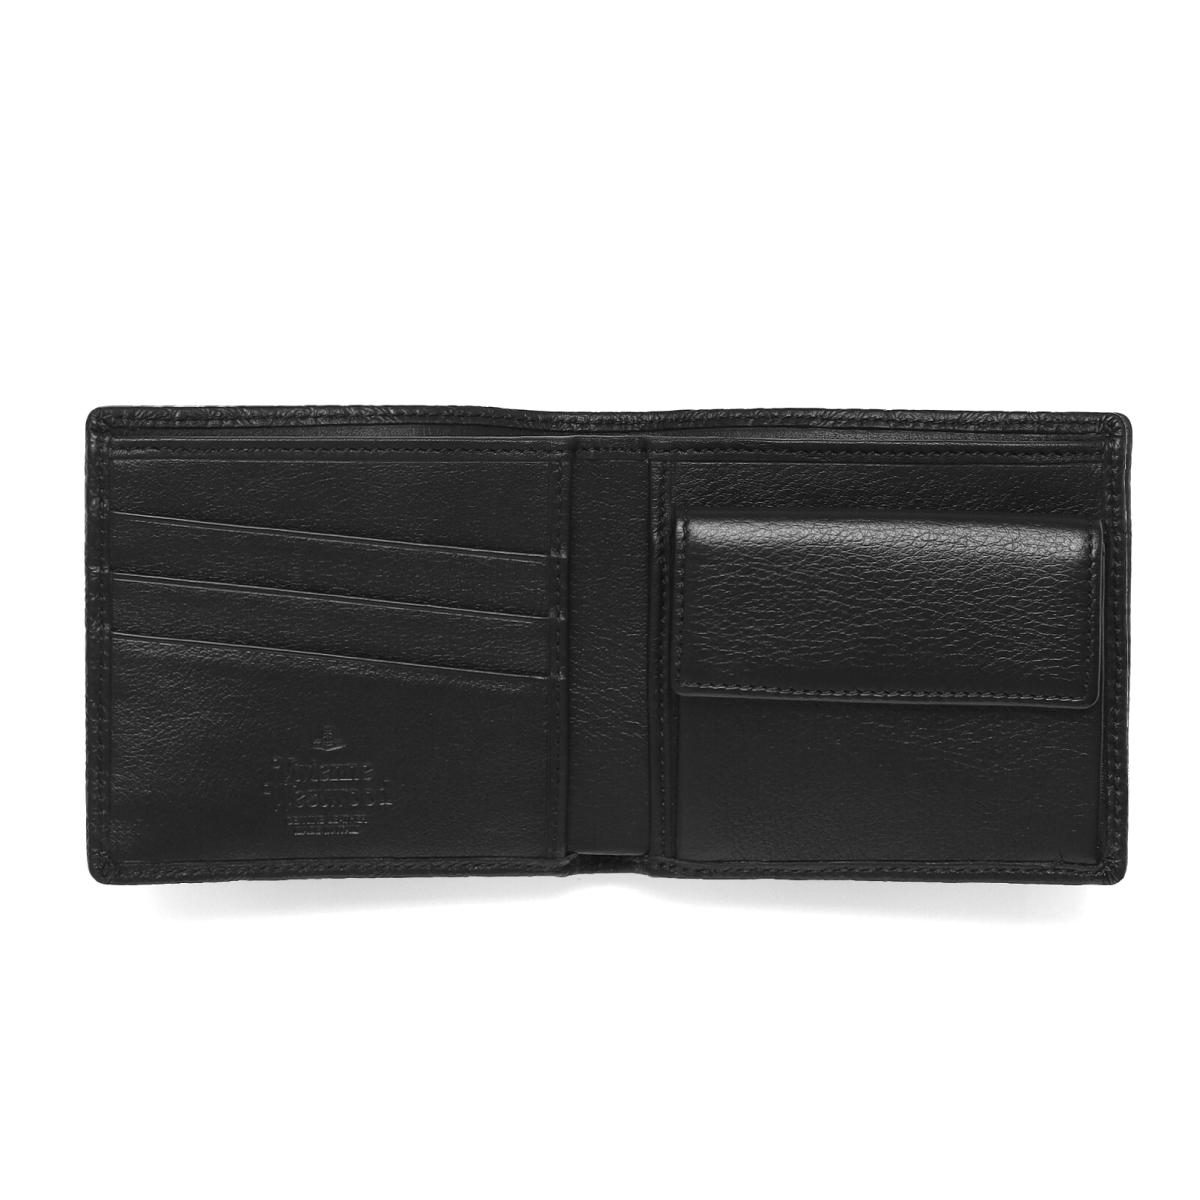 VIVIENNE WESTWOOD ヴィヴィアン ウエストウッド | 二つ折り財布 | GEORGE ジョージ